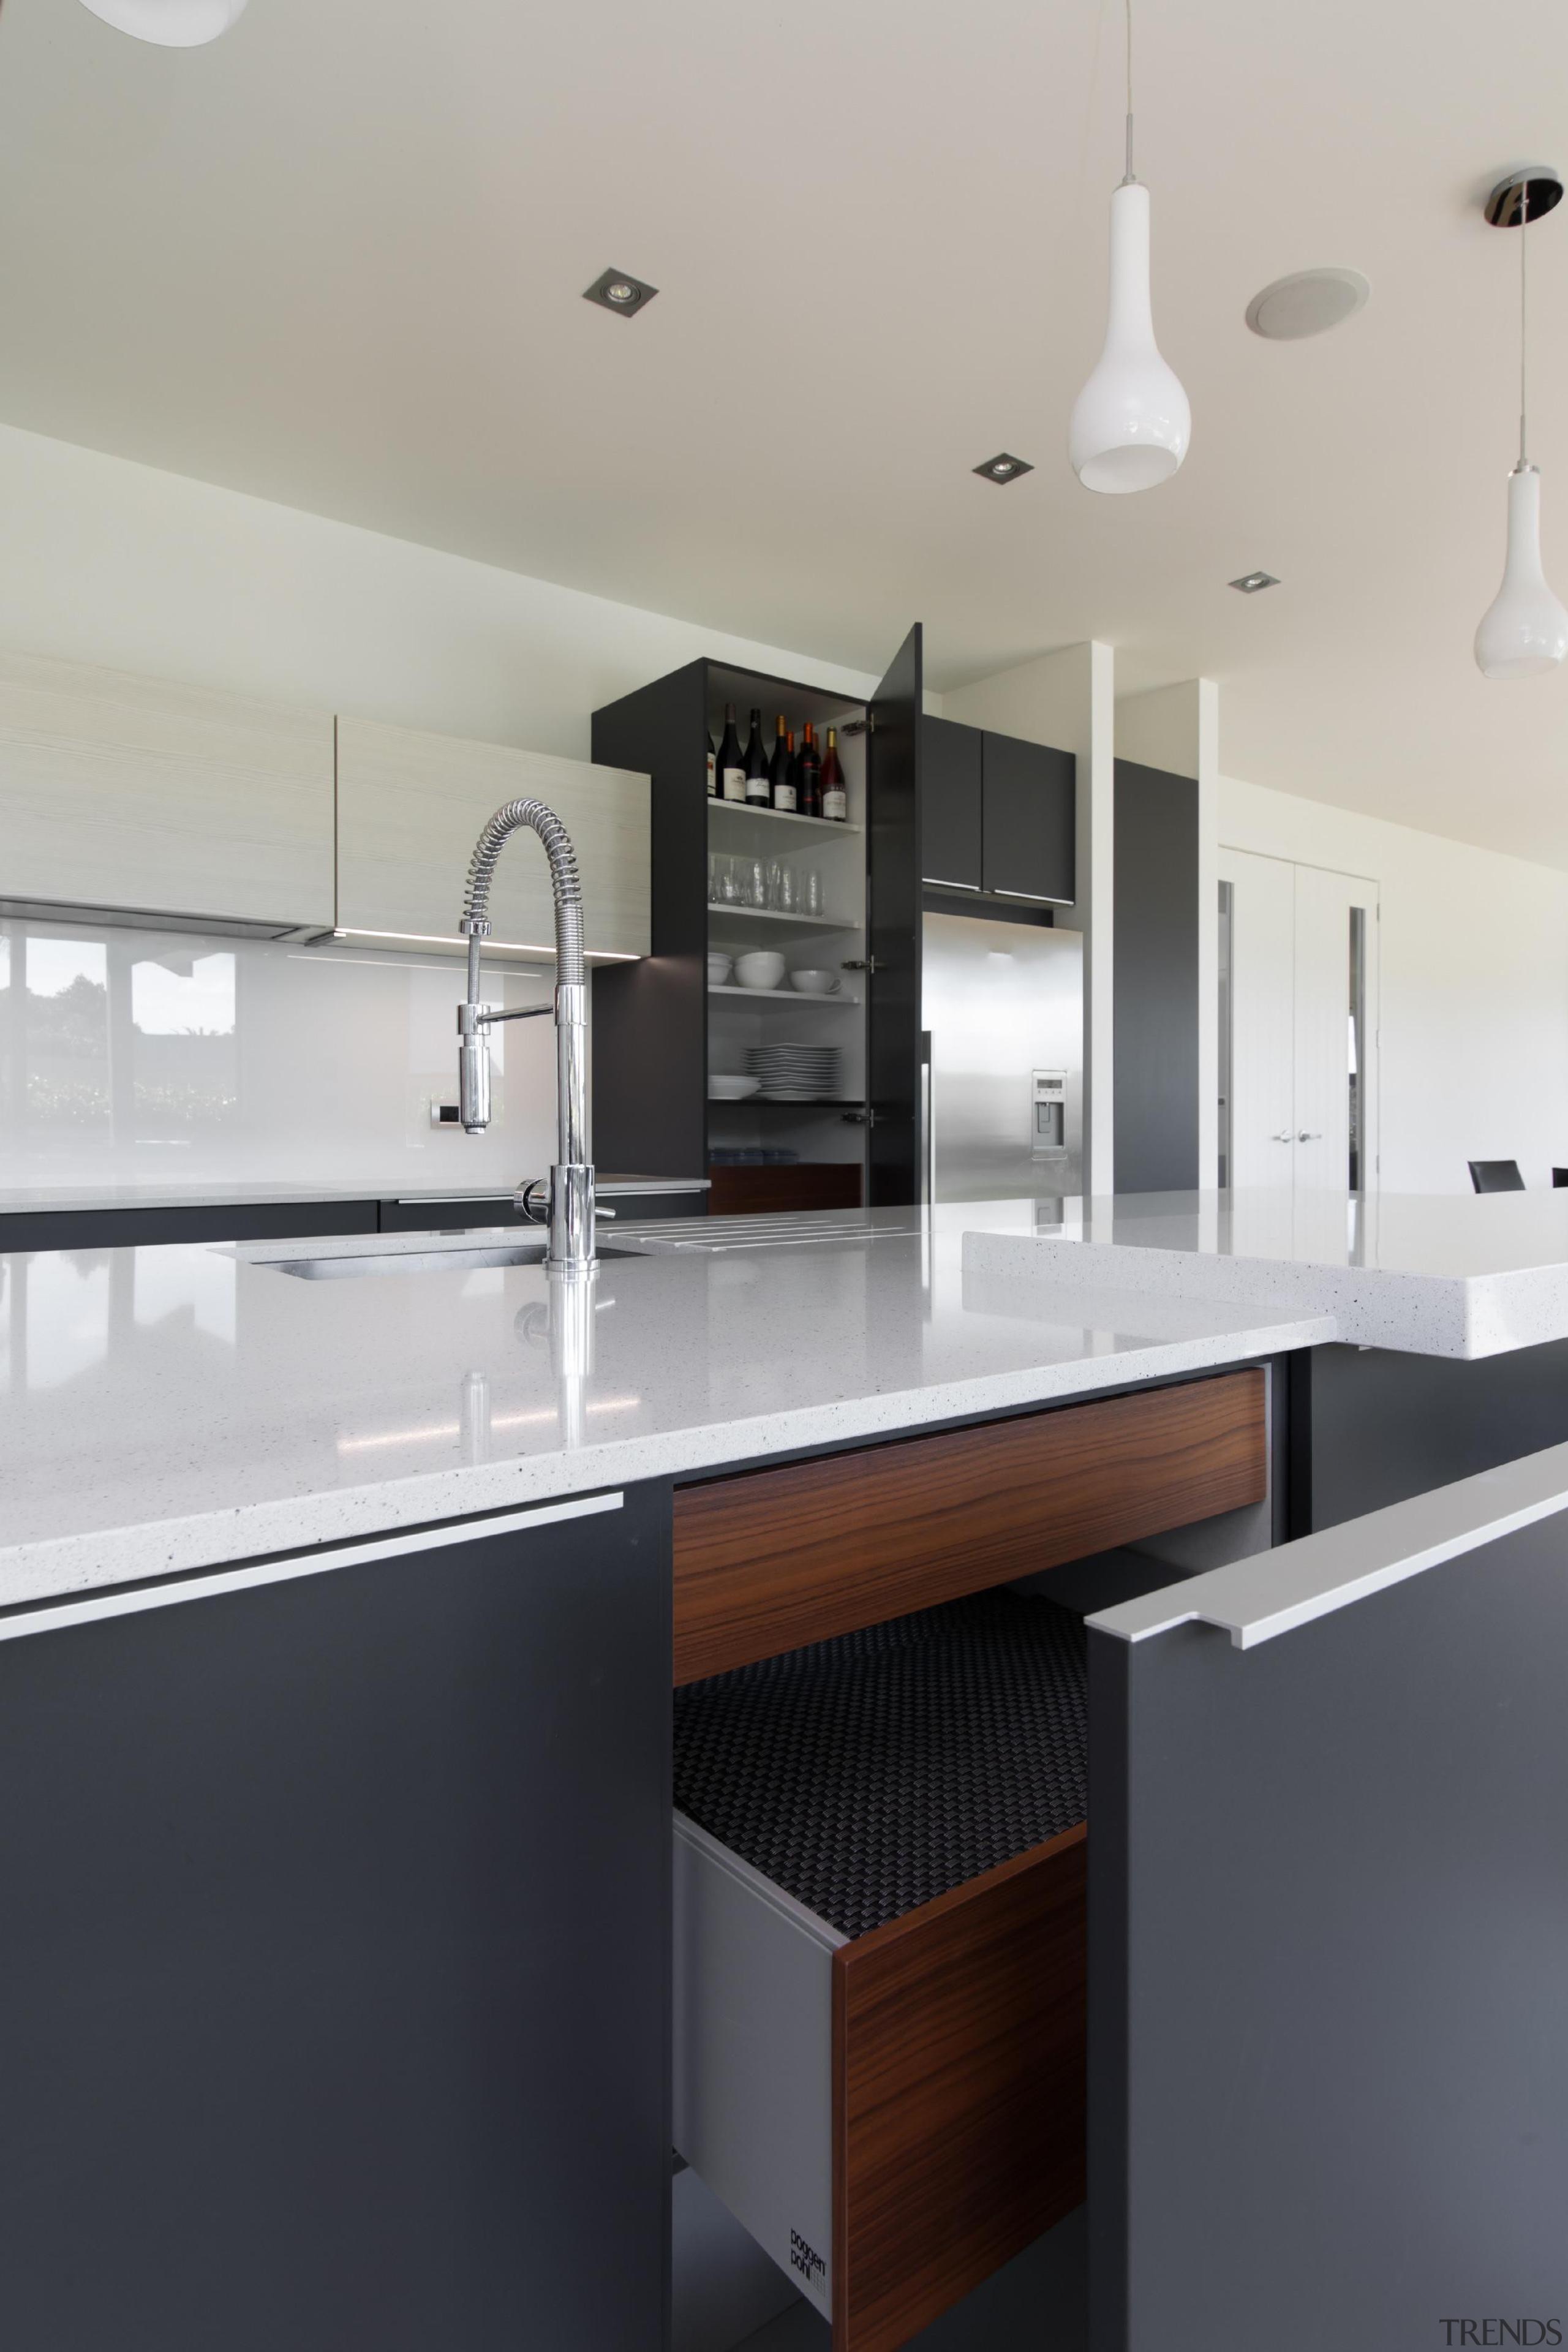 Dark blue and white themed kitchen designFor more cabinetry, countertop, interior design, kitchen, product design, room, sink, gray, black